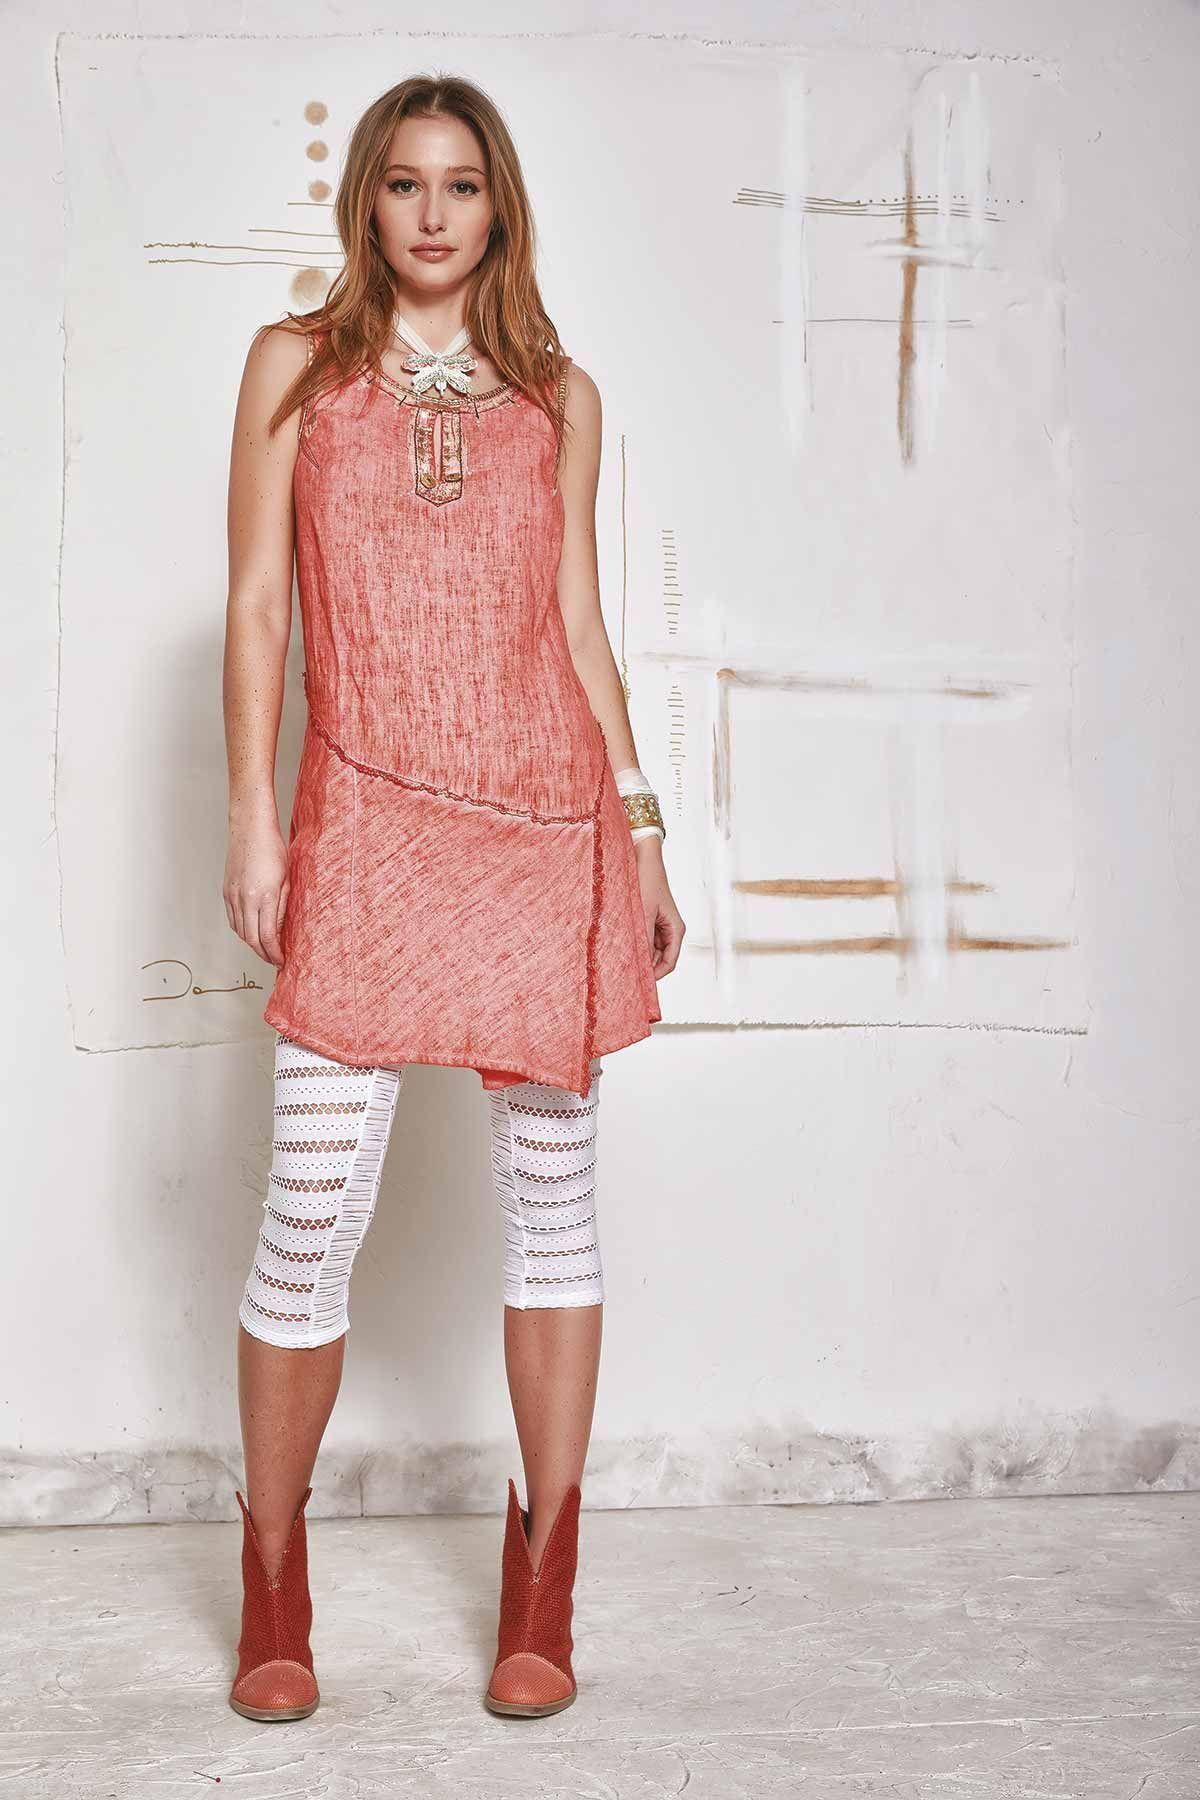 DANIELA DALLAVALLE - Lookbook #woman #PE17 #danieladallavalle ...